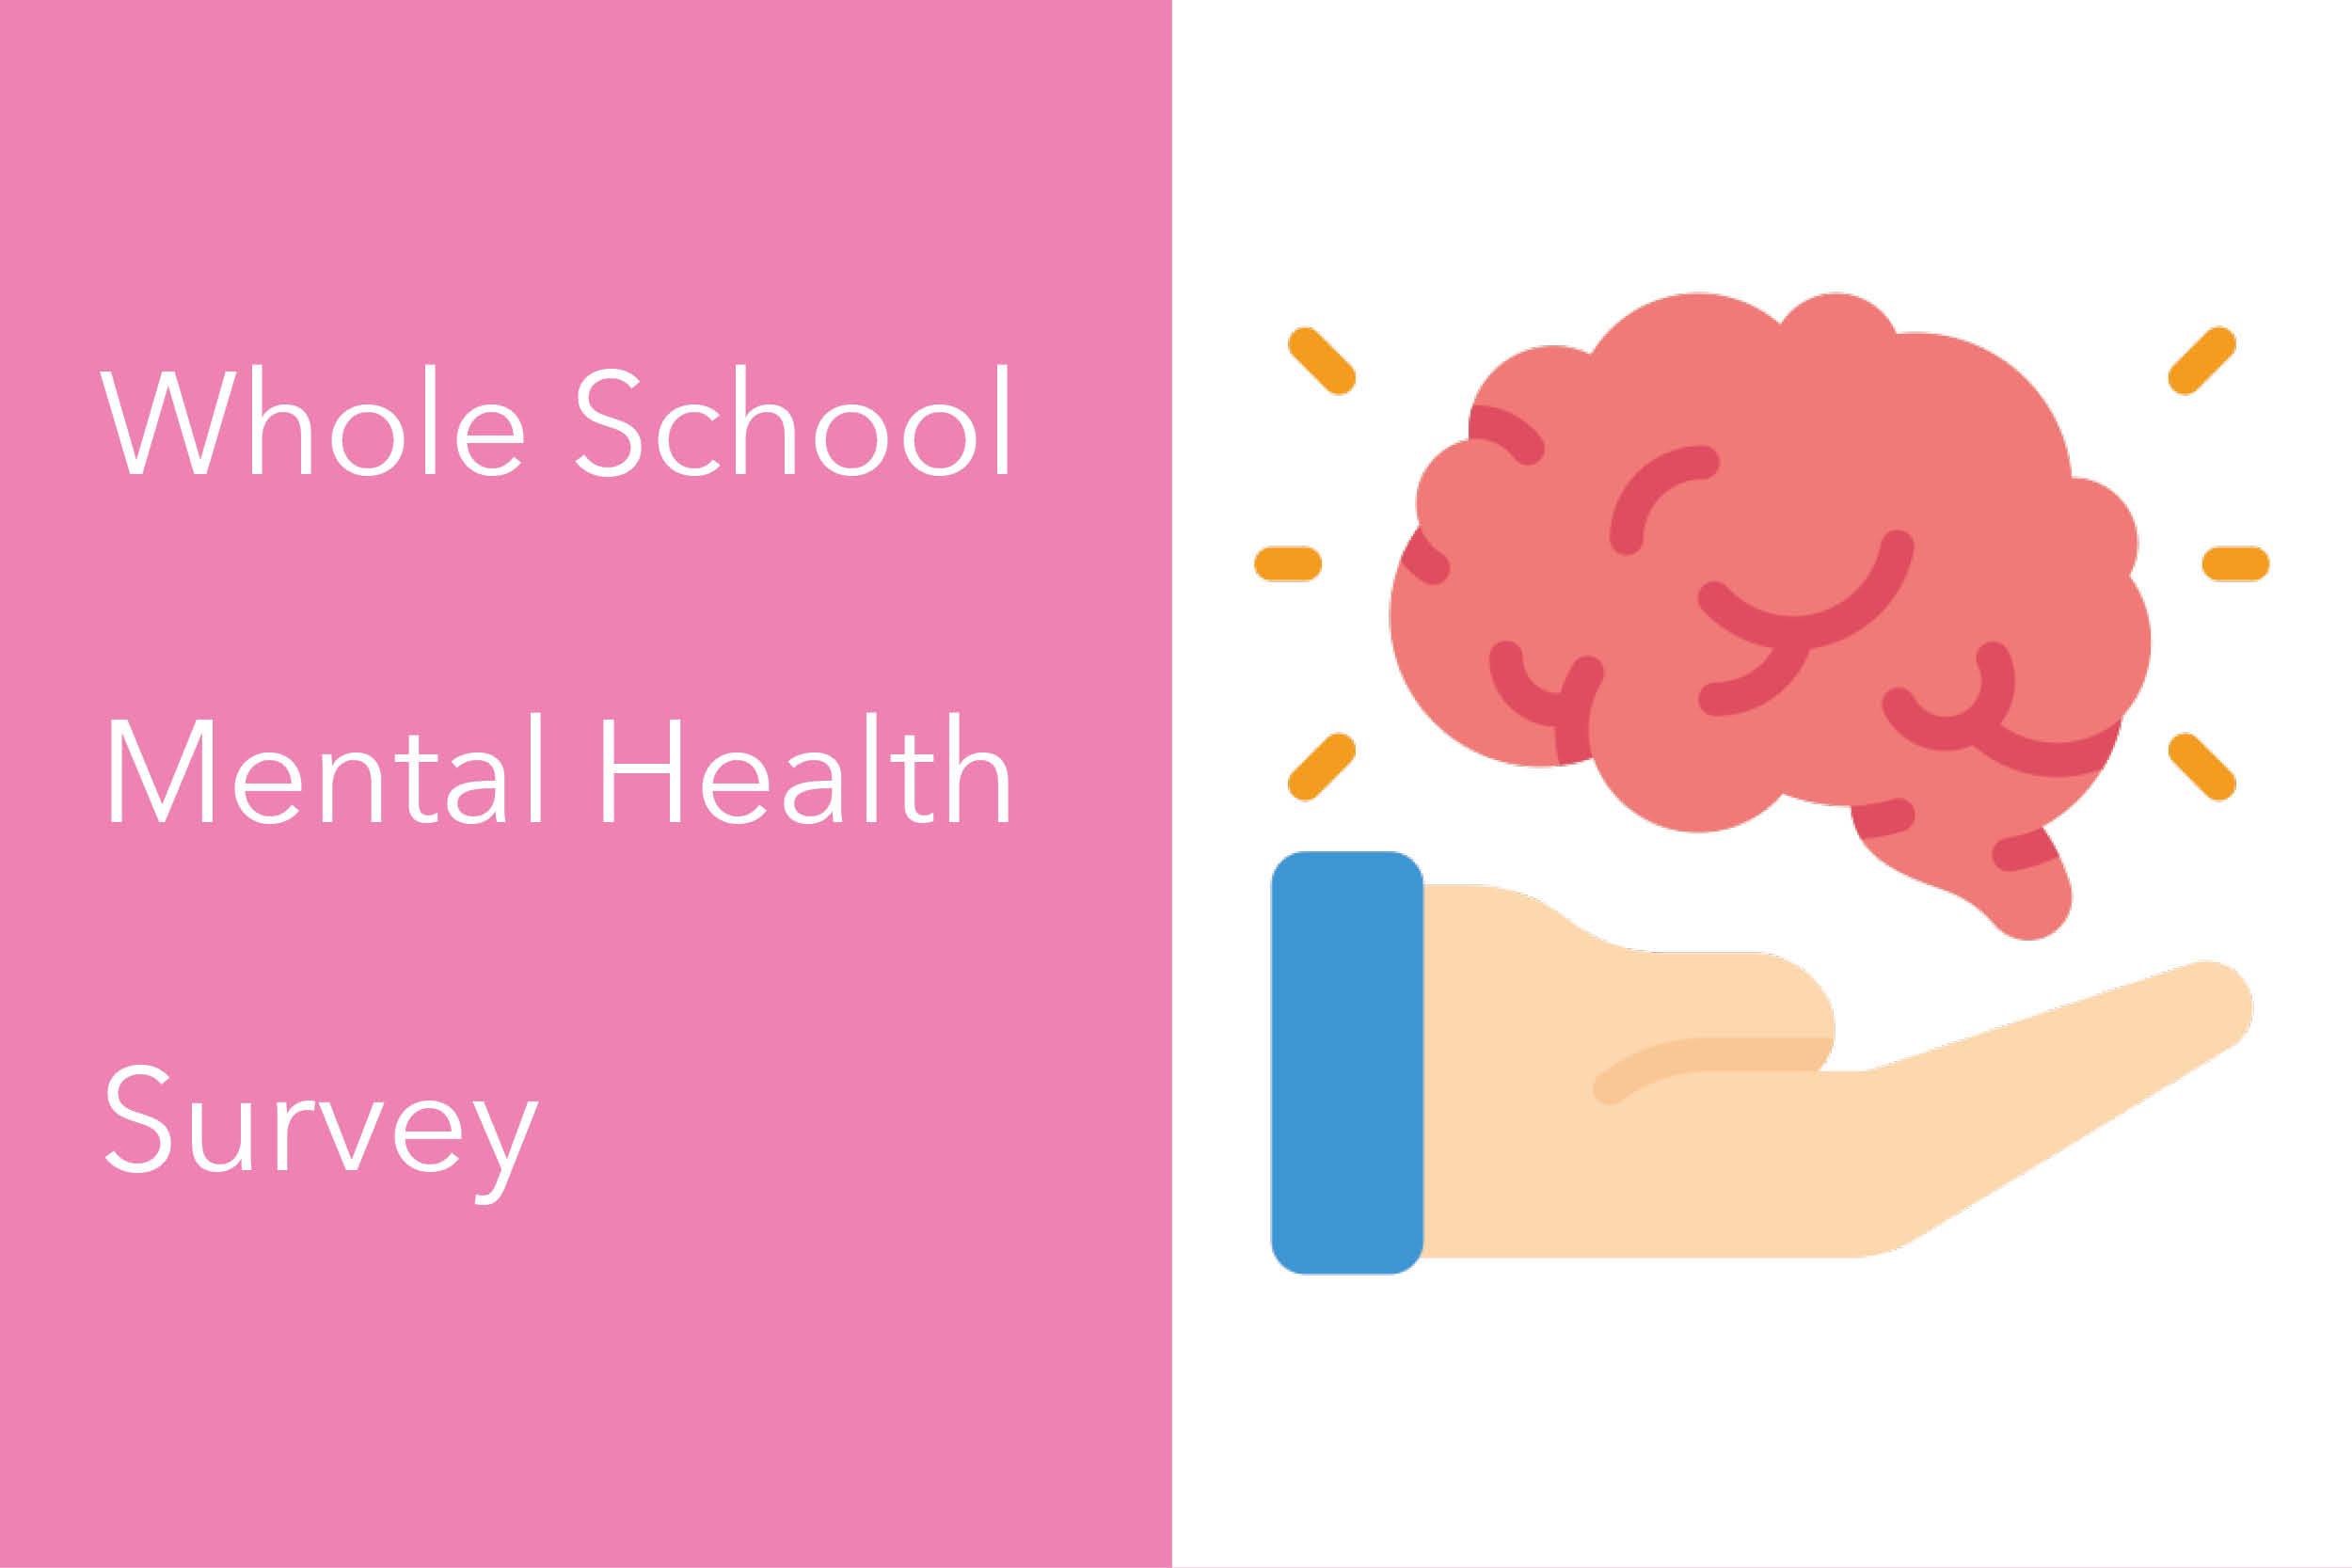 Whole School Mental Health Survey